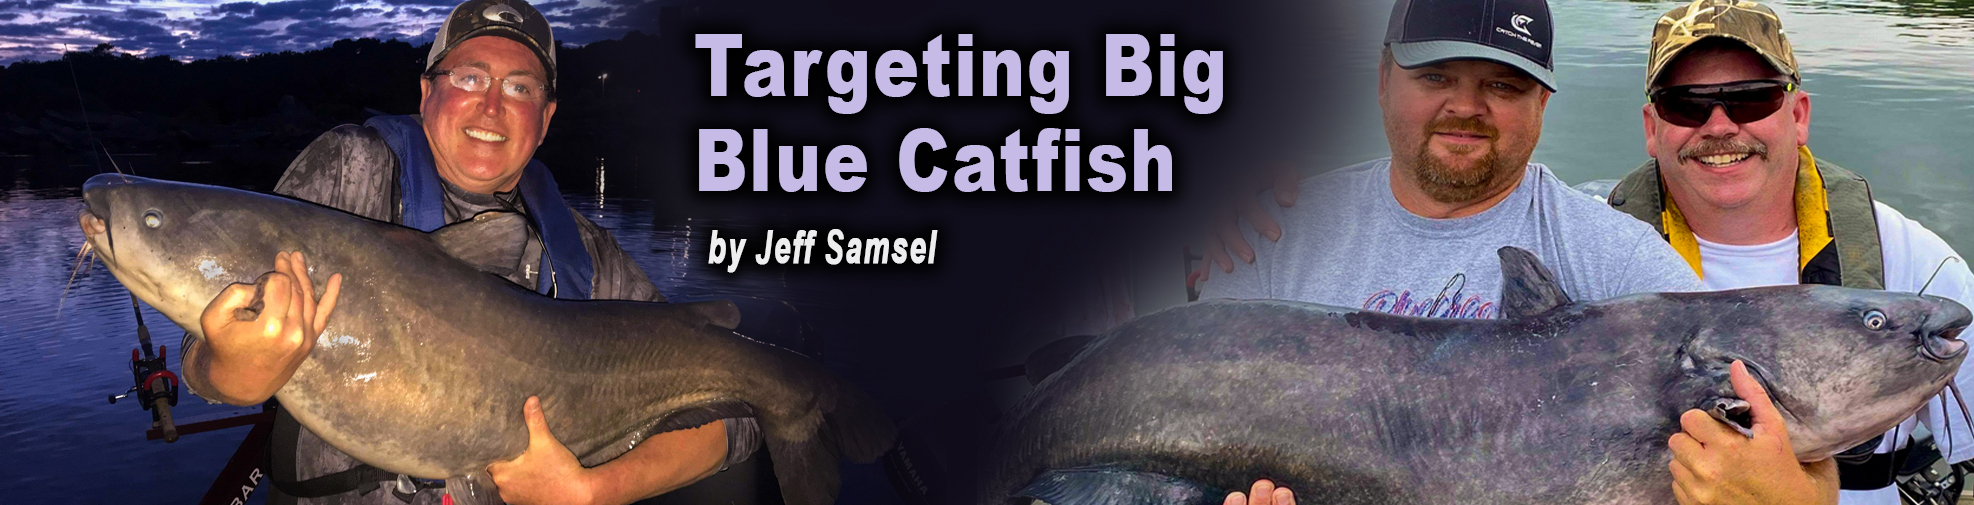 Article Slider art for targeting big blue catfish by Jeff Samsel